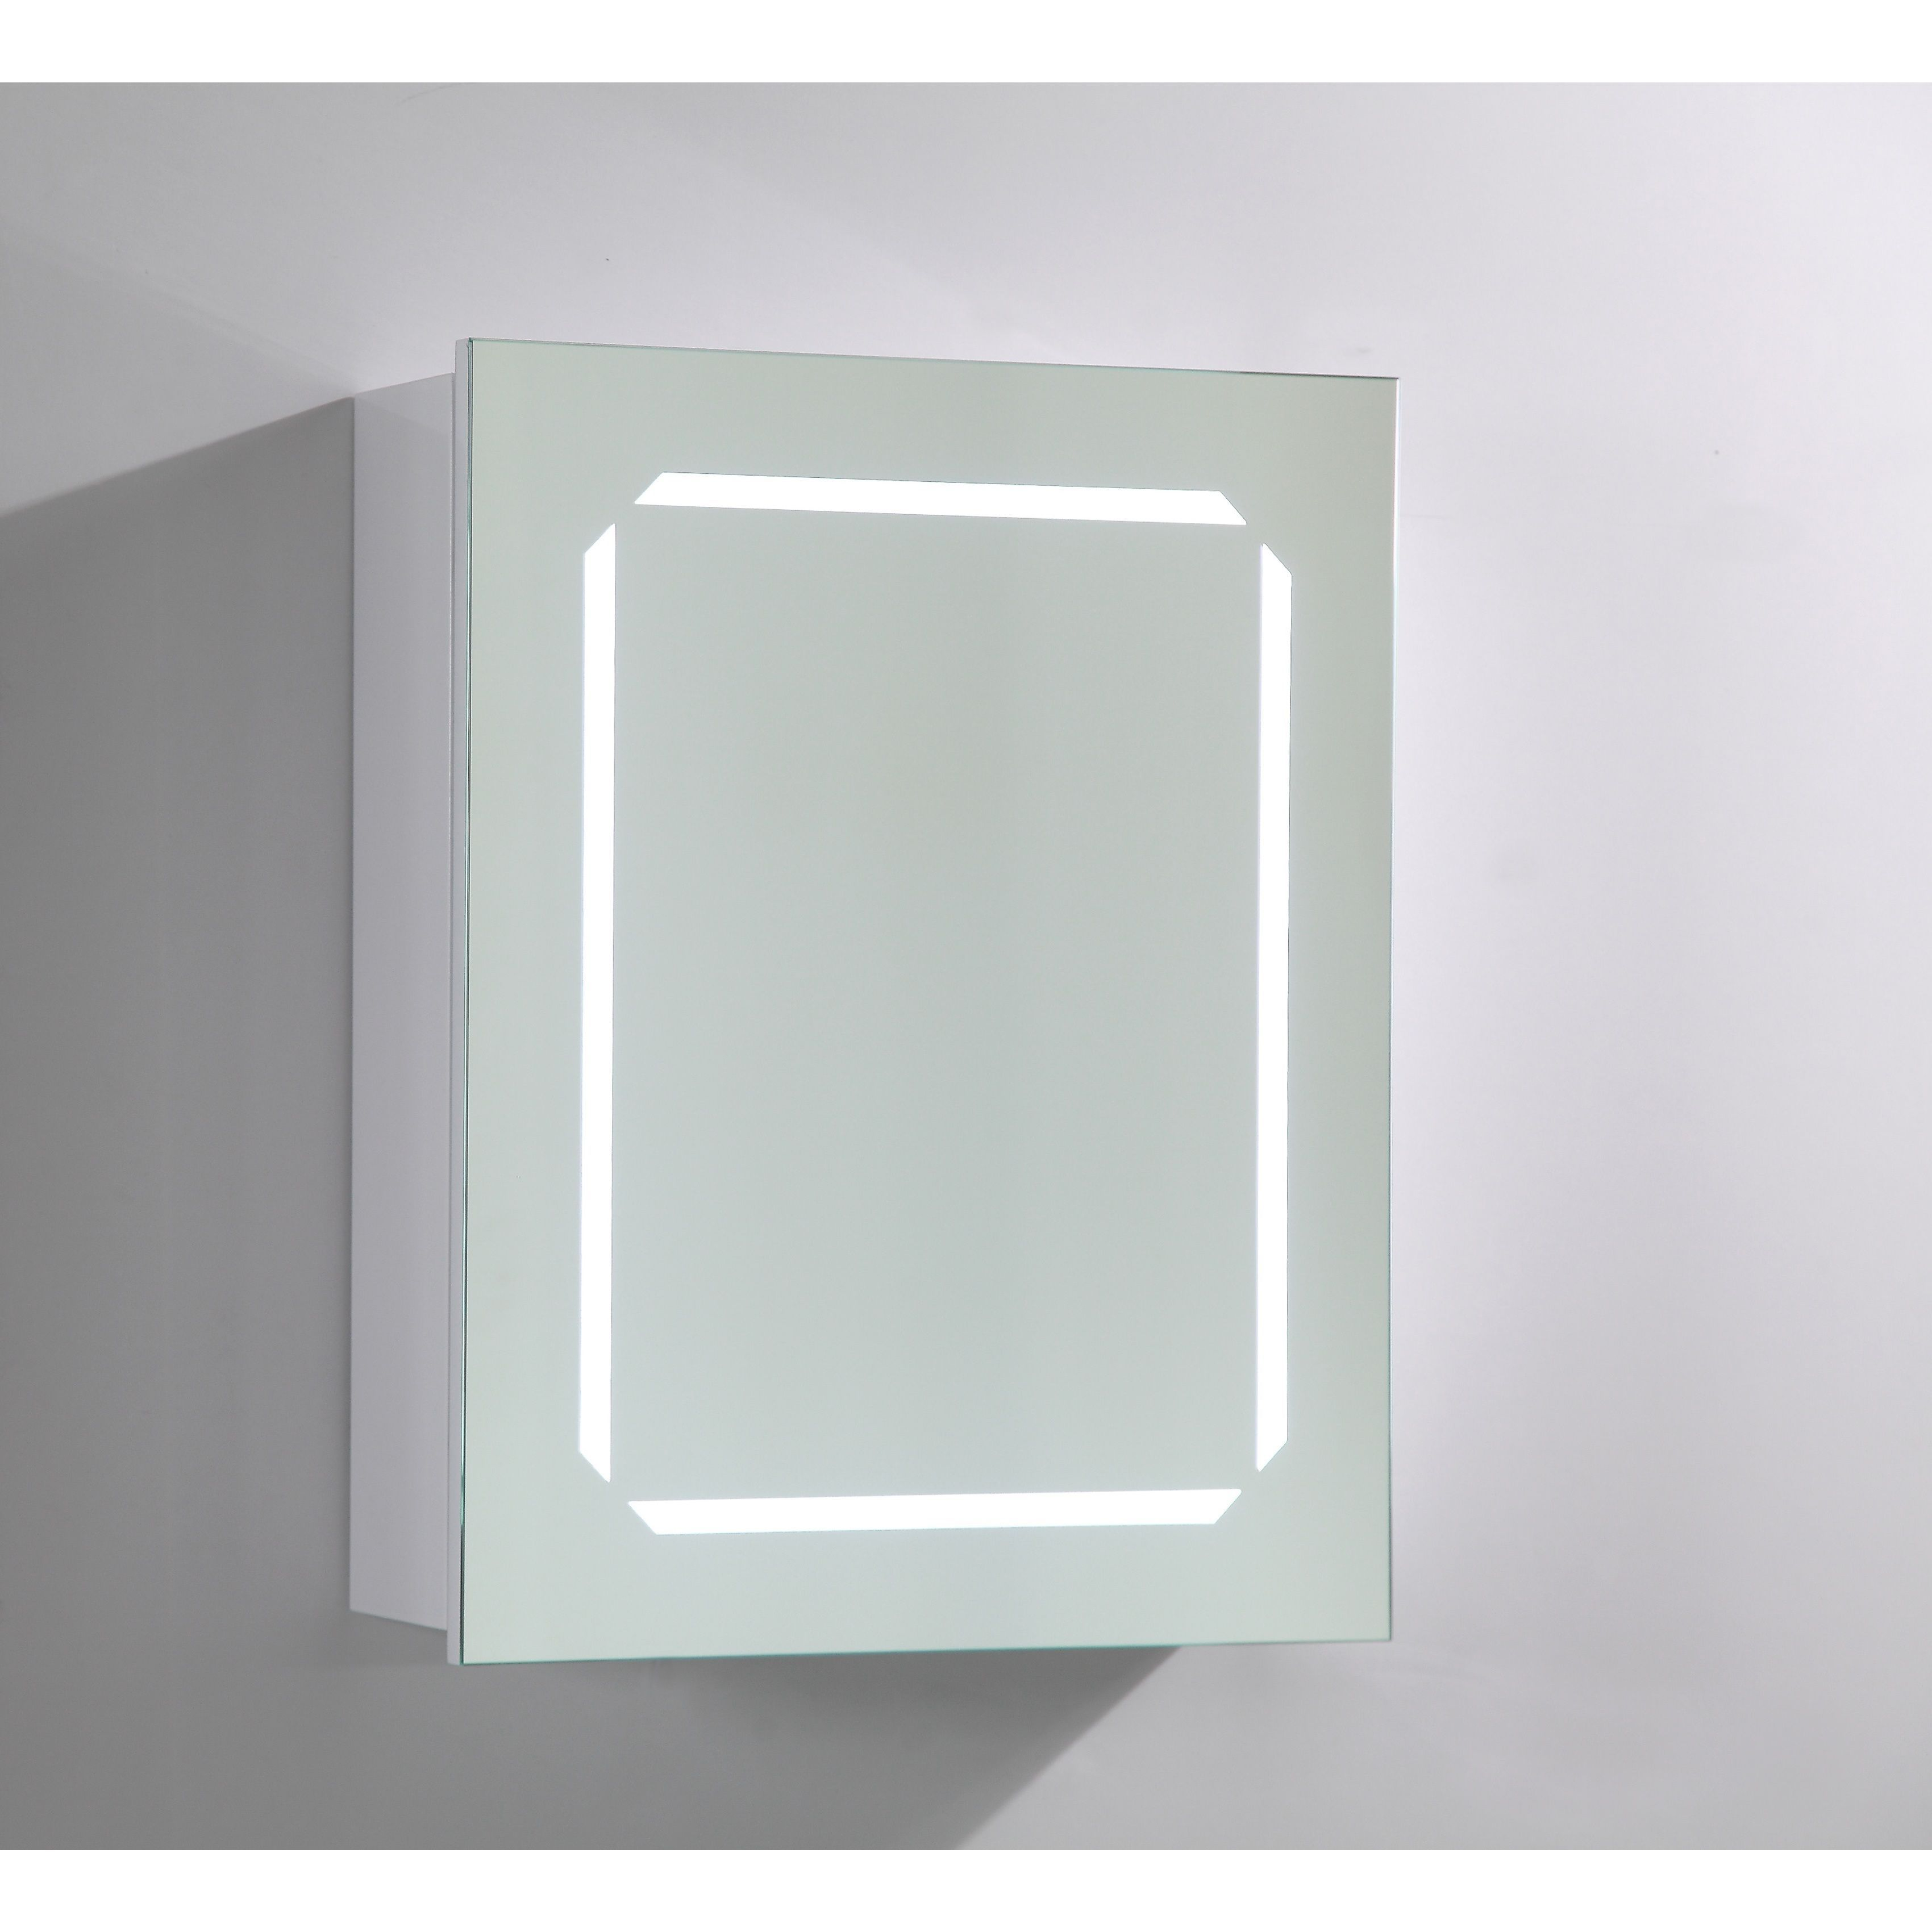 Inspirational Led Lighted Recessed Medicine Cabinet